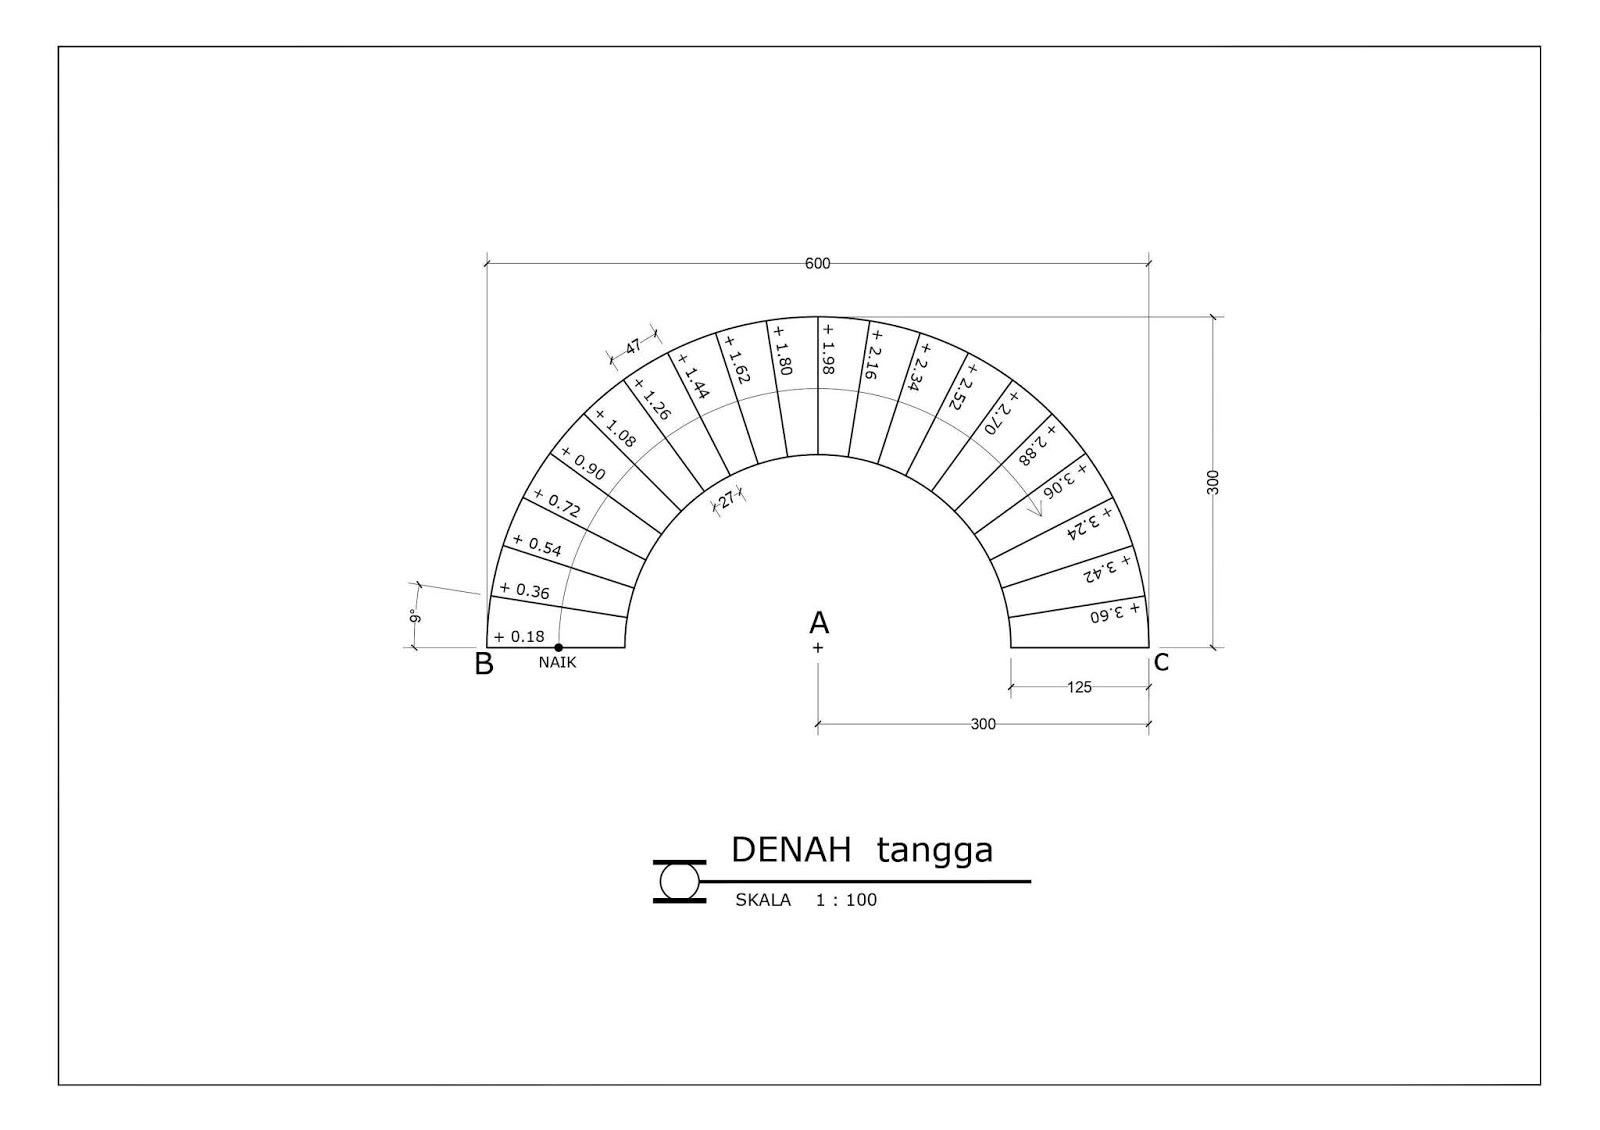 Gambar denah untuk membuat tangga layang atau setengah lingkaran